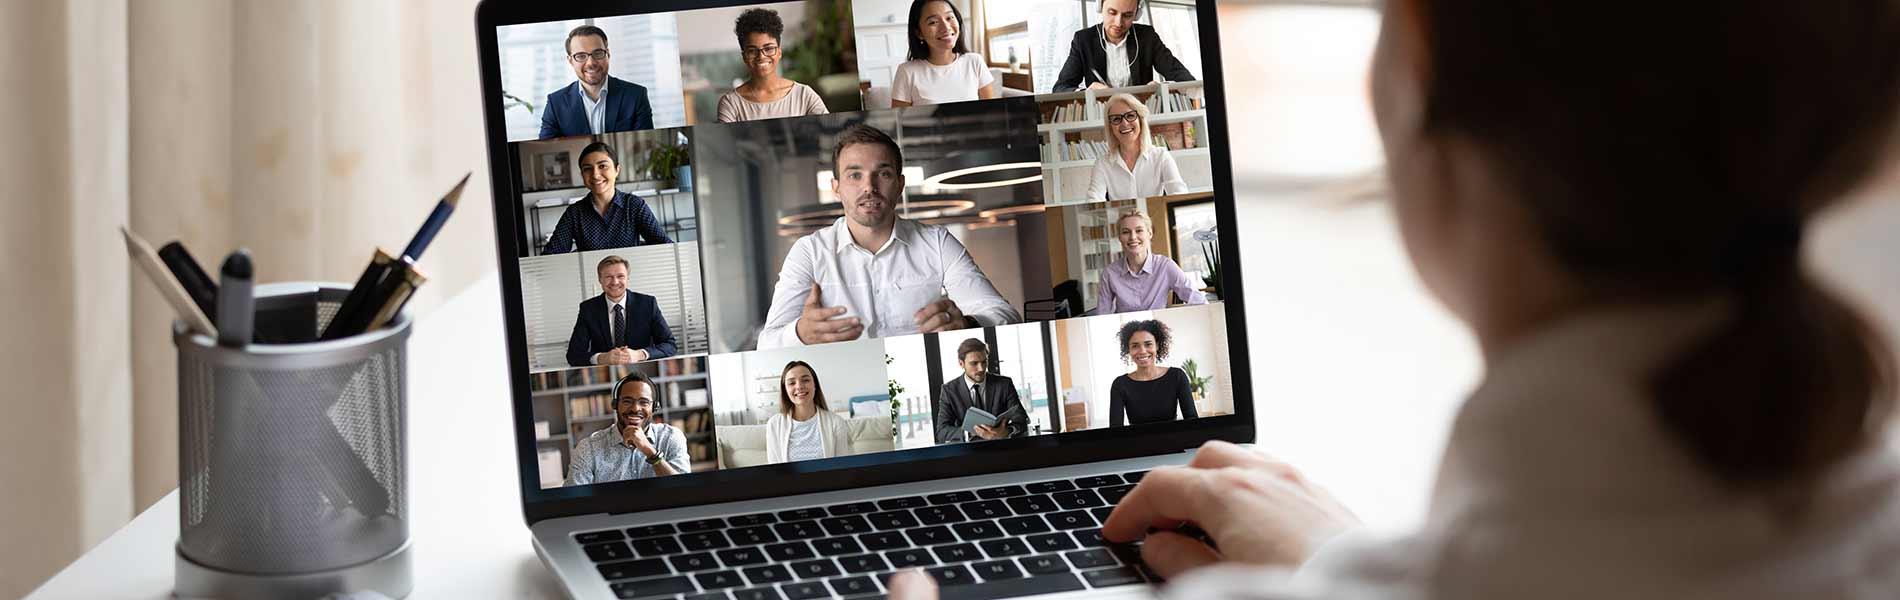 Mailchimp, ClickDimensions, Dynamics 365 Marketing, Teams